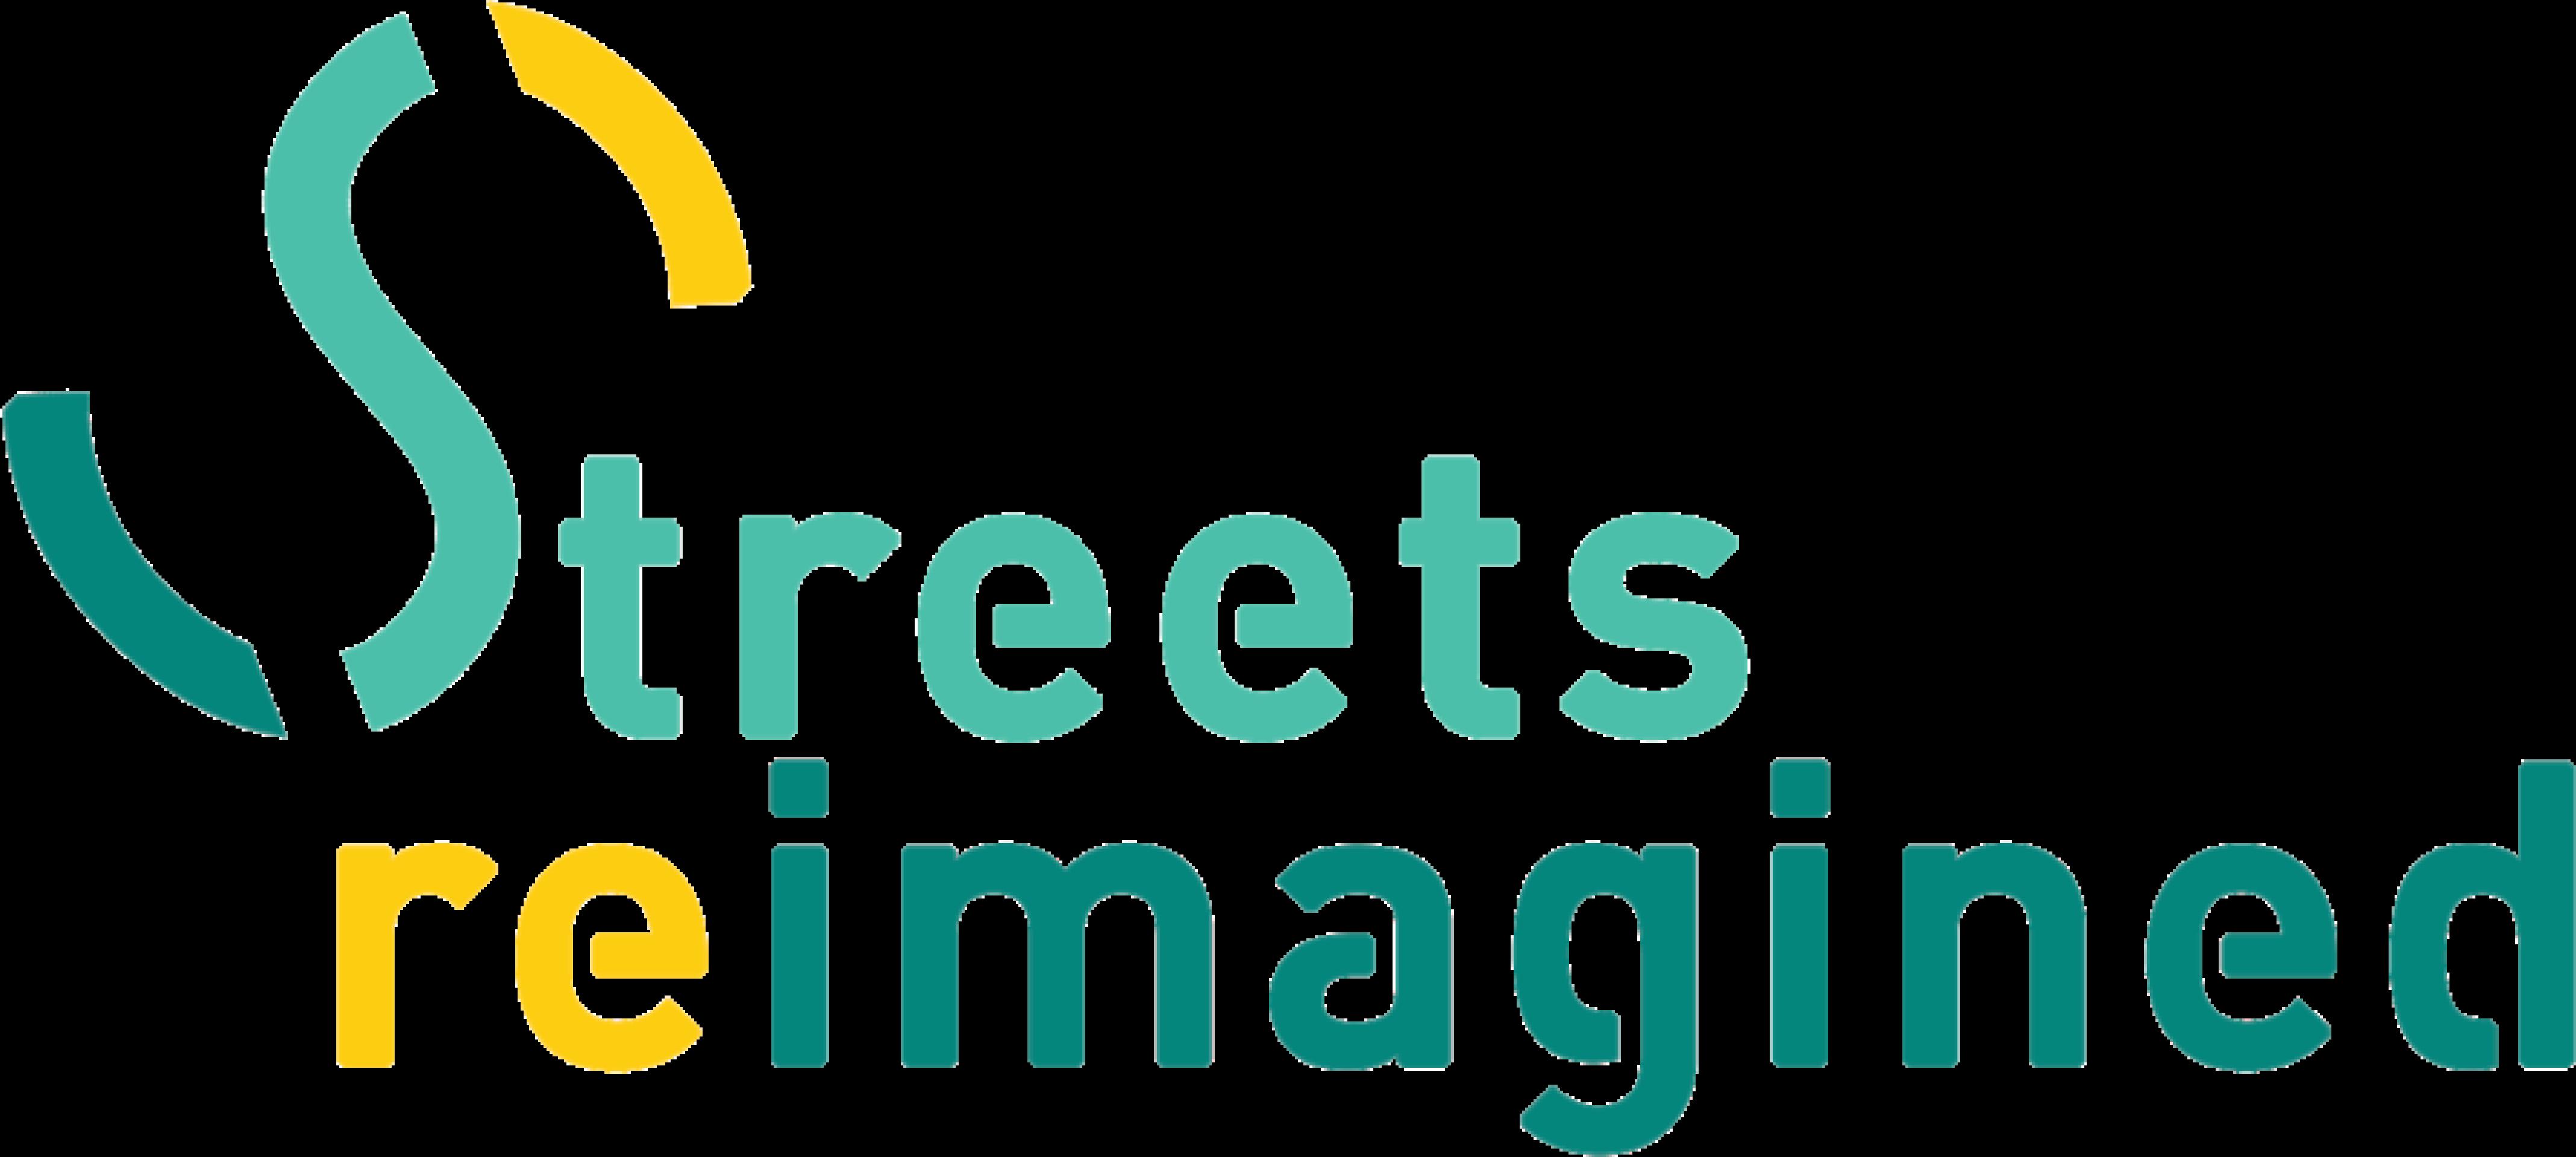 Streets Reimagined logo